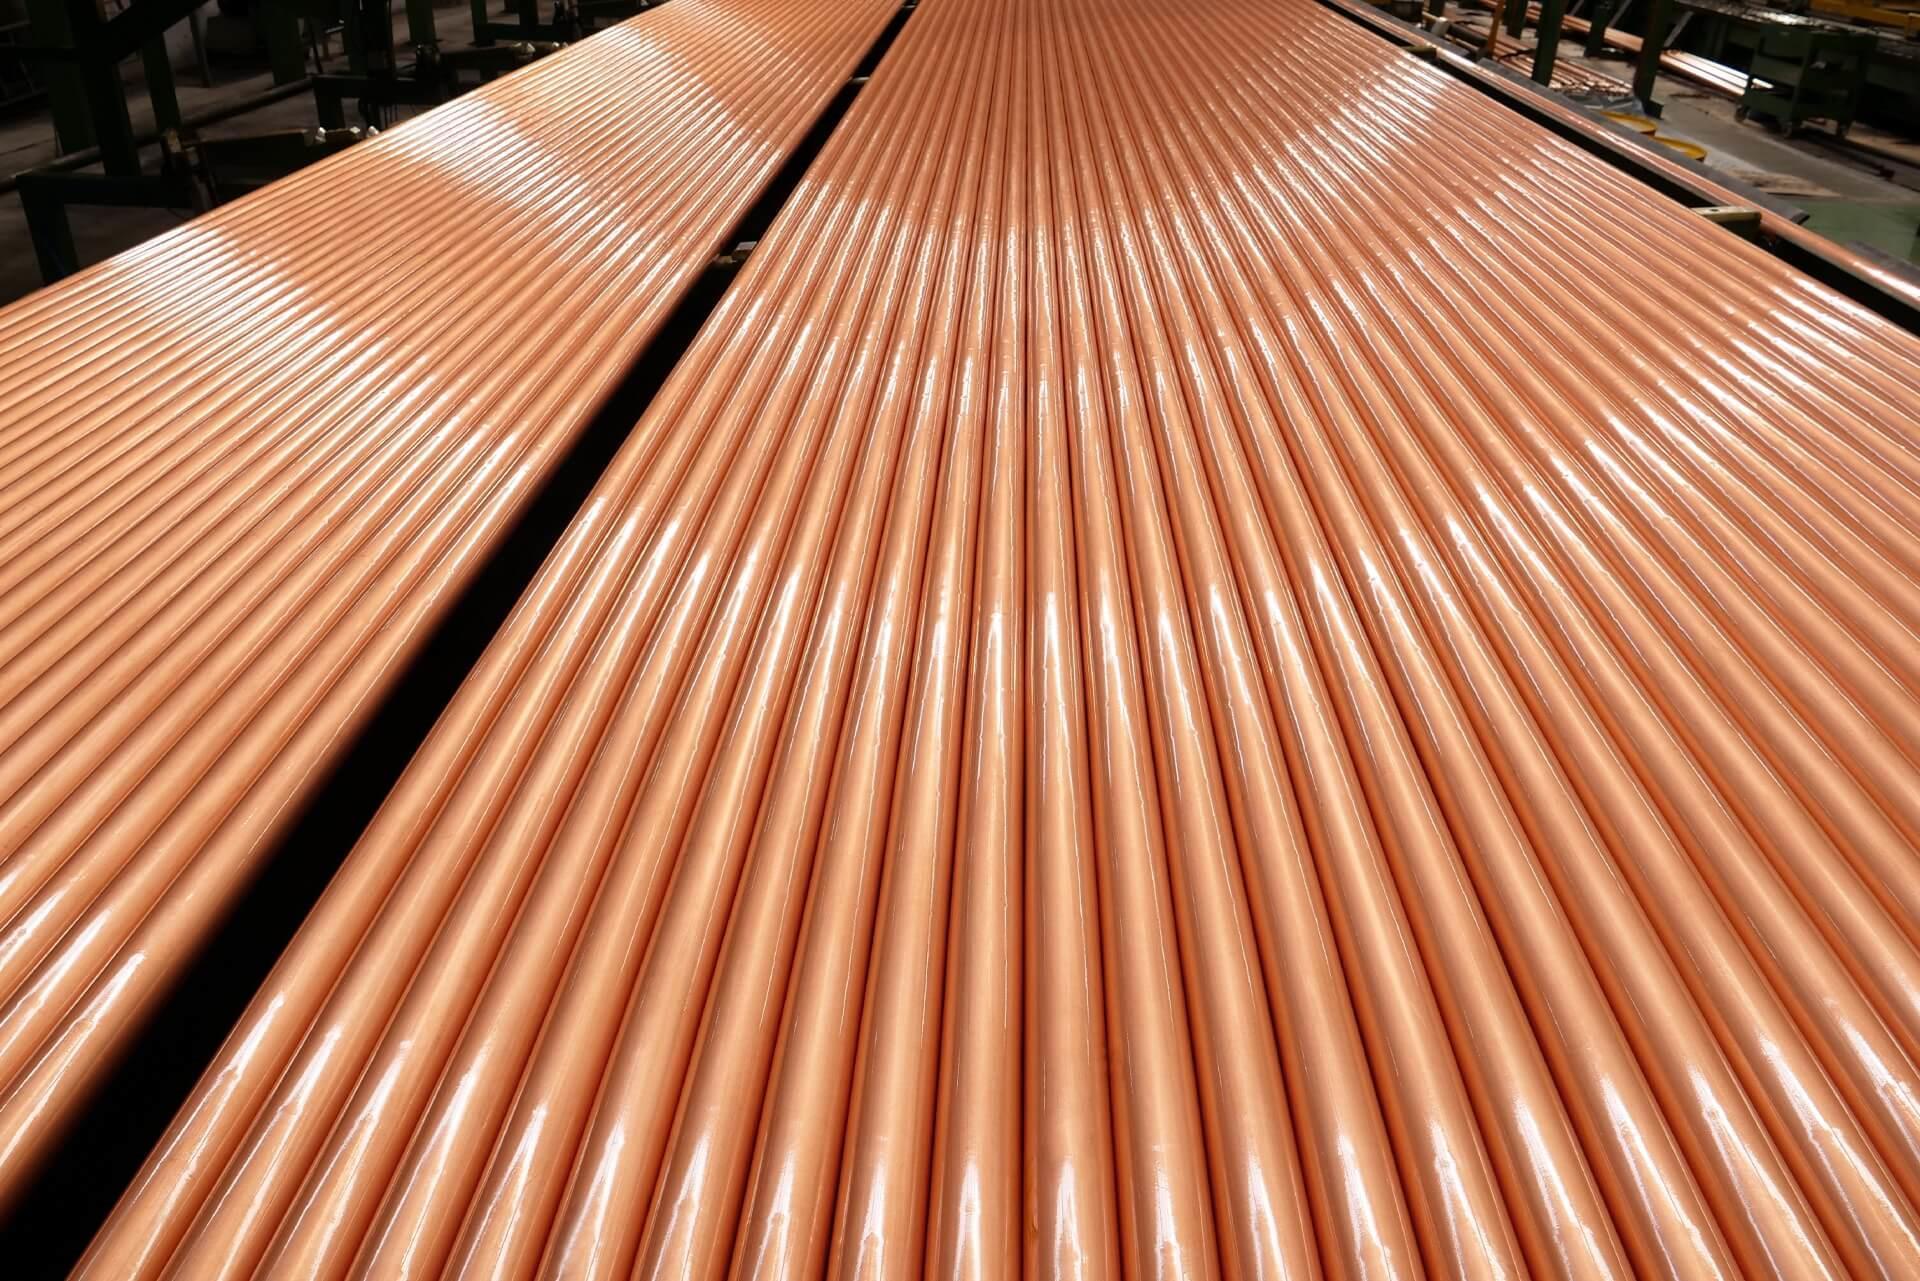 Halcor, o μεγαλύτερος παραγωγός σωλήνων χαλκού στην Ευρώπη